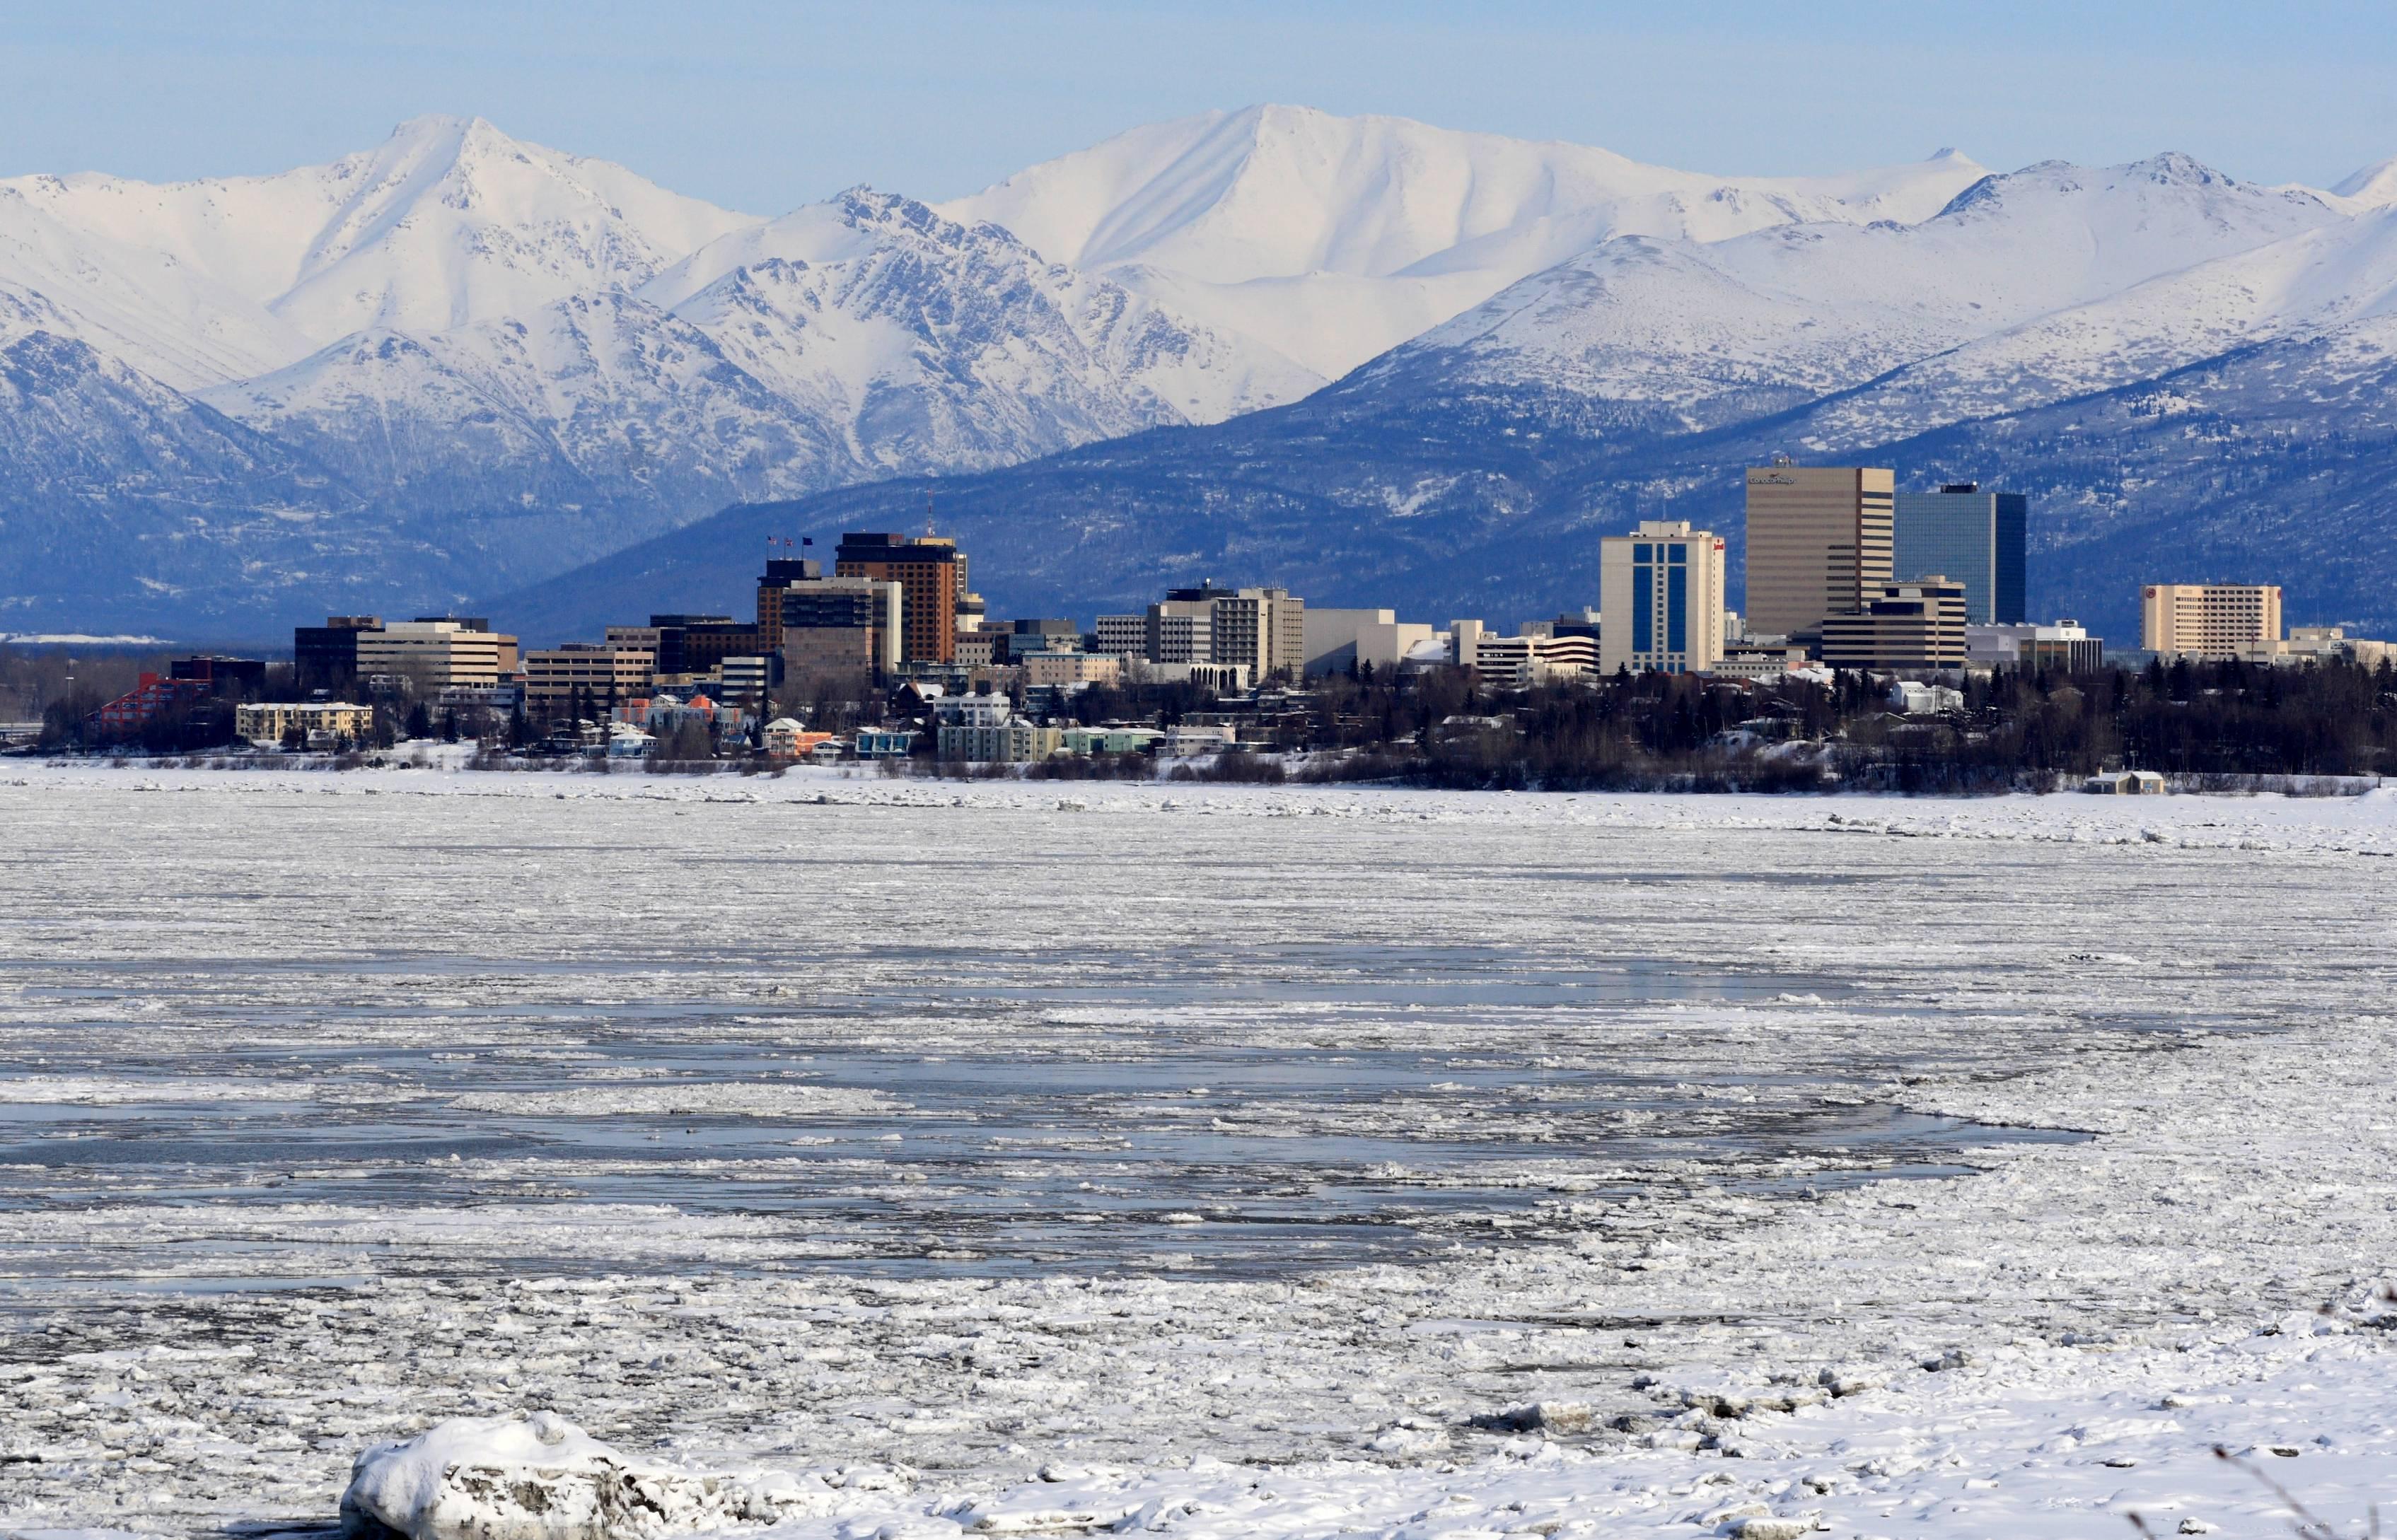 hastighet dating i Anchorage Alaska.net dating programvare